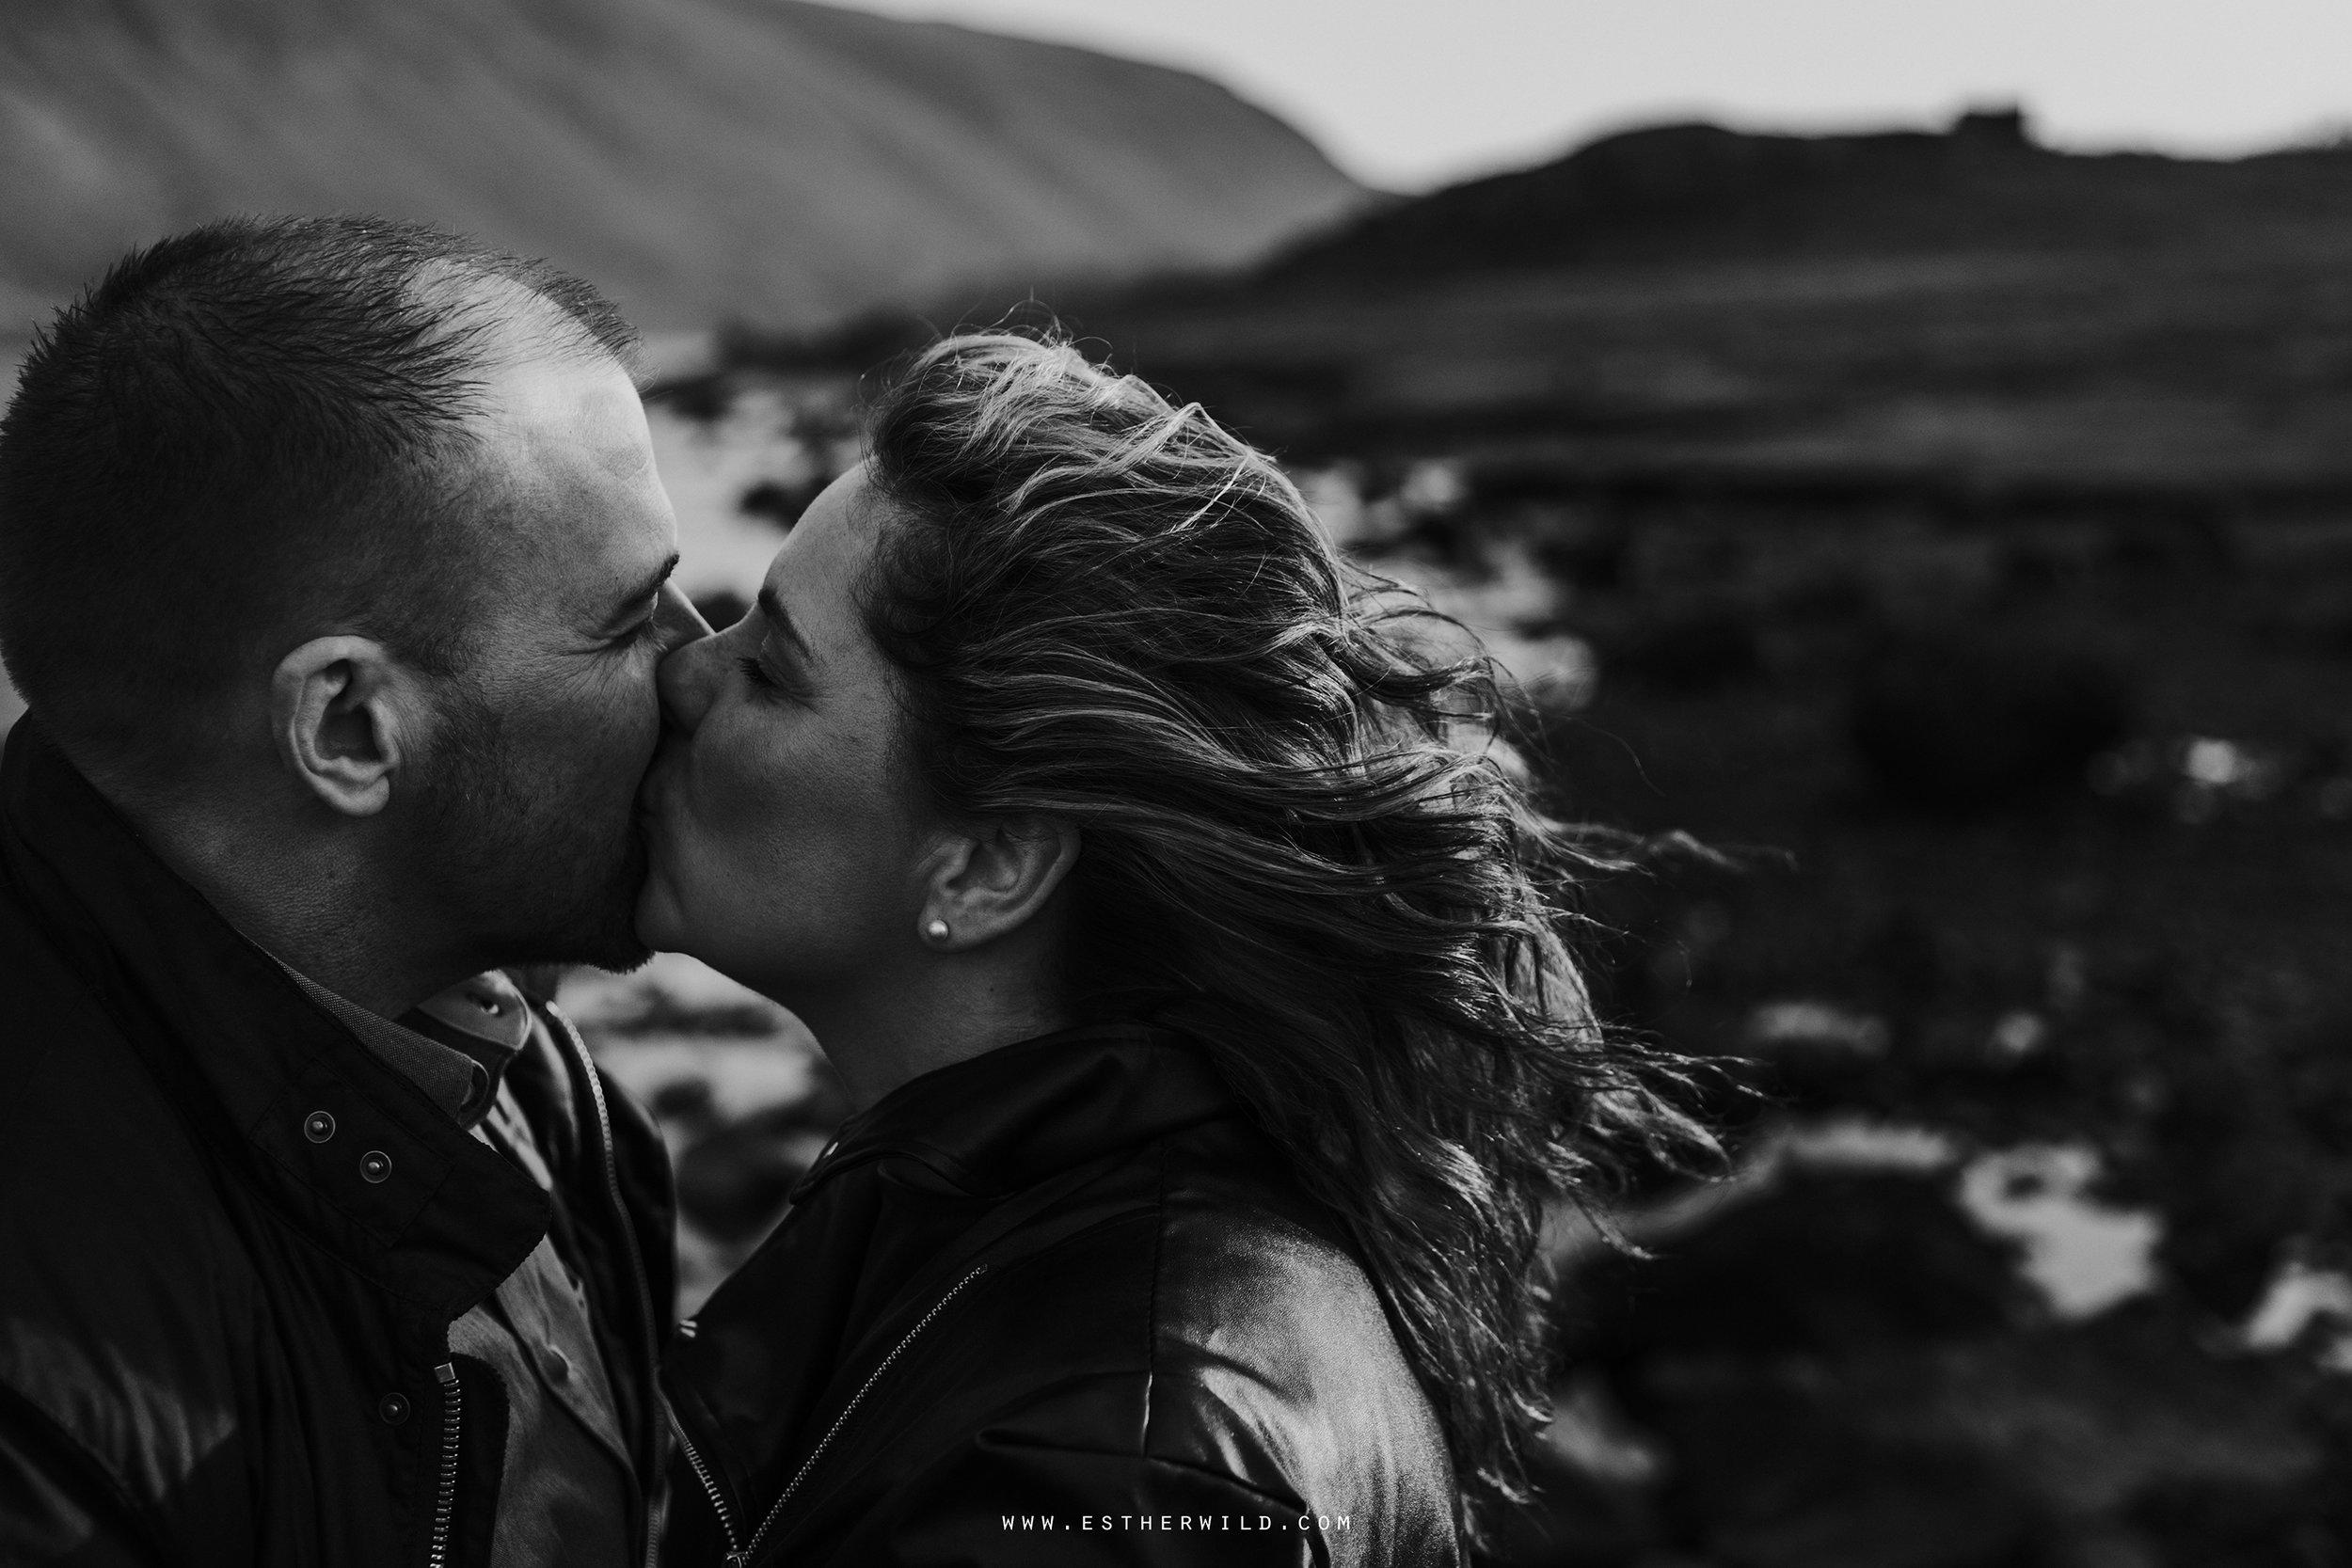 Cumbria_Lake_District_Wasdale_Wedding_Photographer_Destination_Engagement_Anniversary_Esther_Wild_IMG_4778.jpg